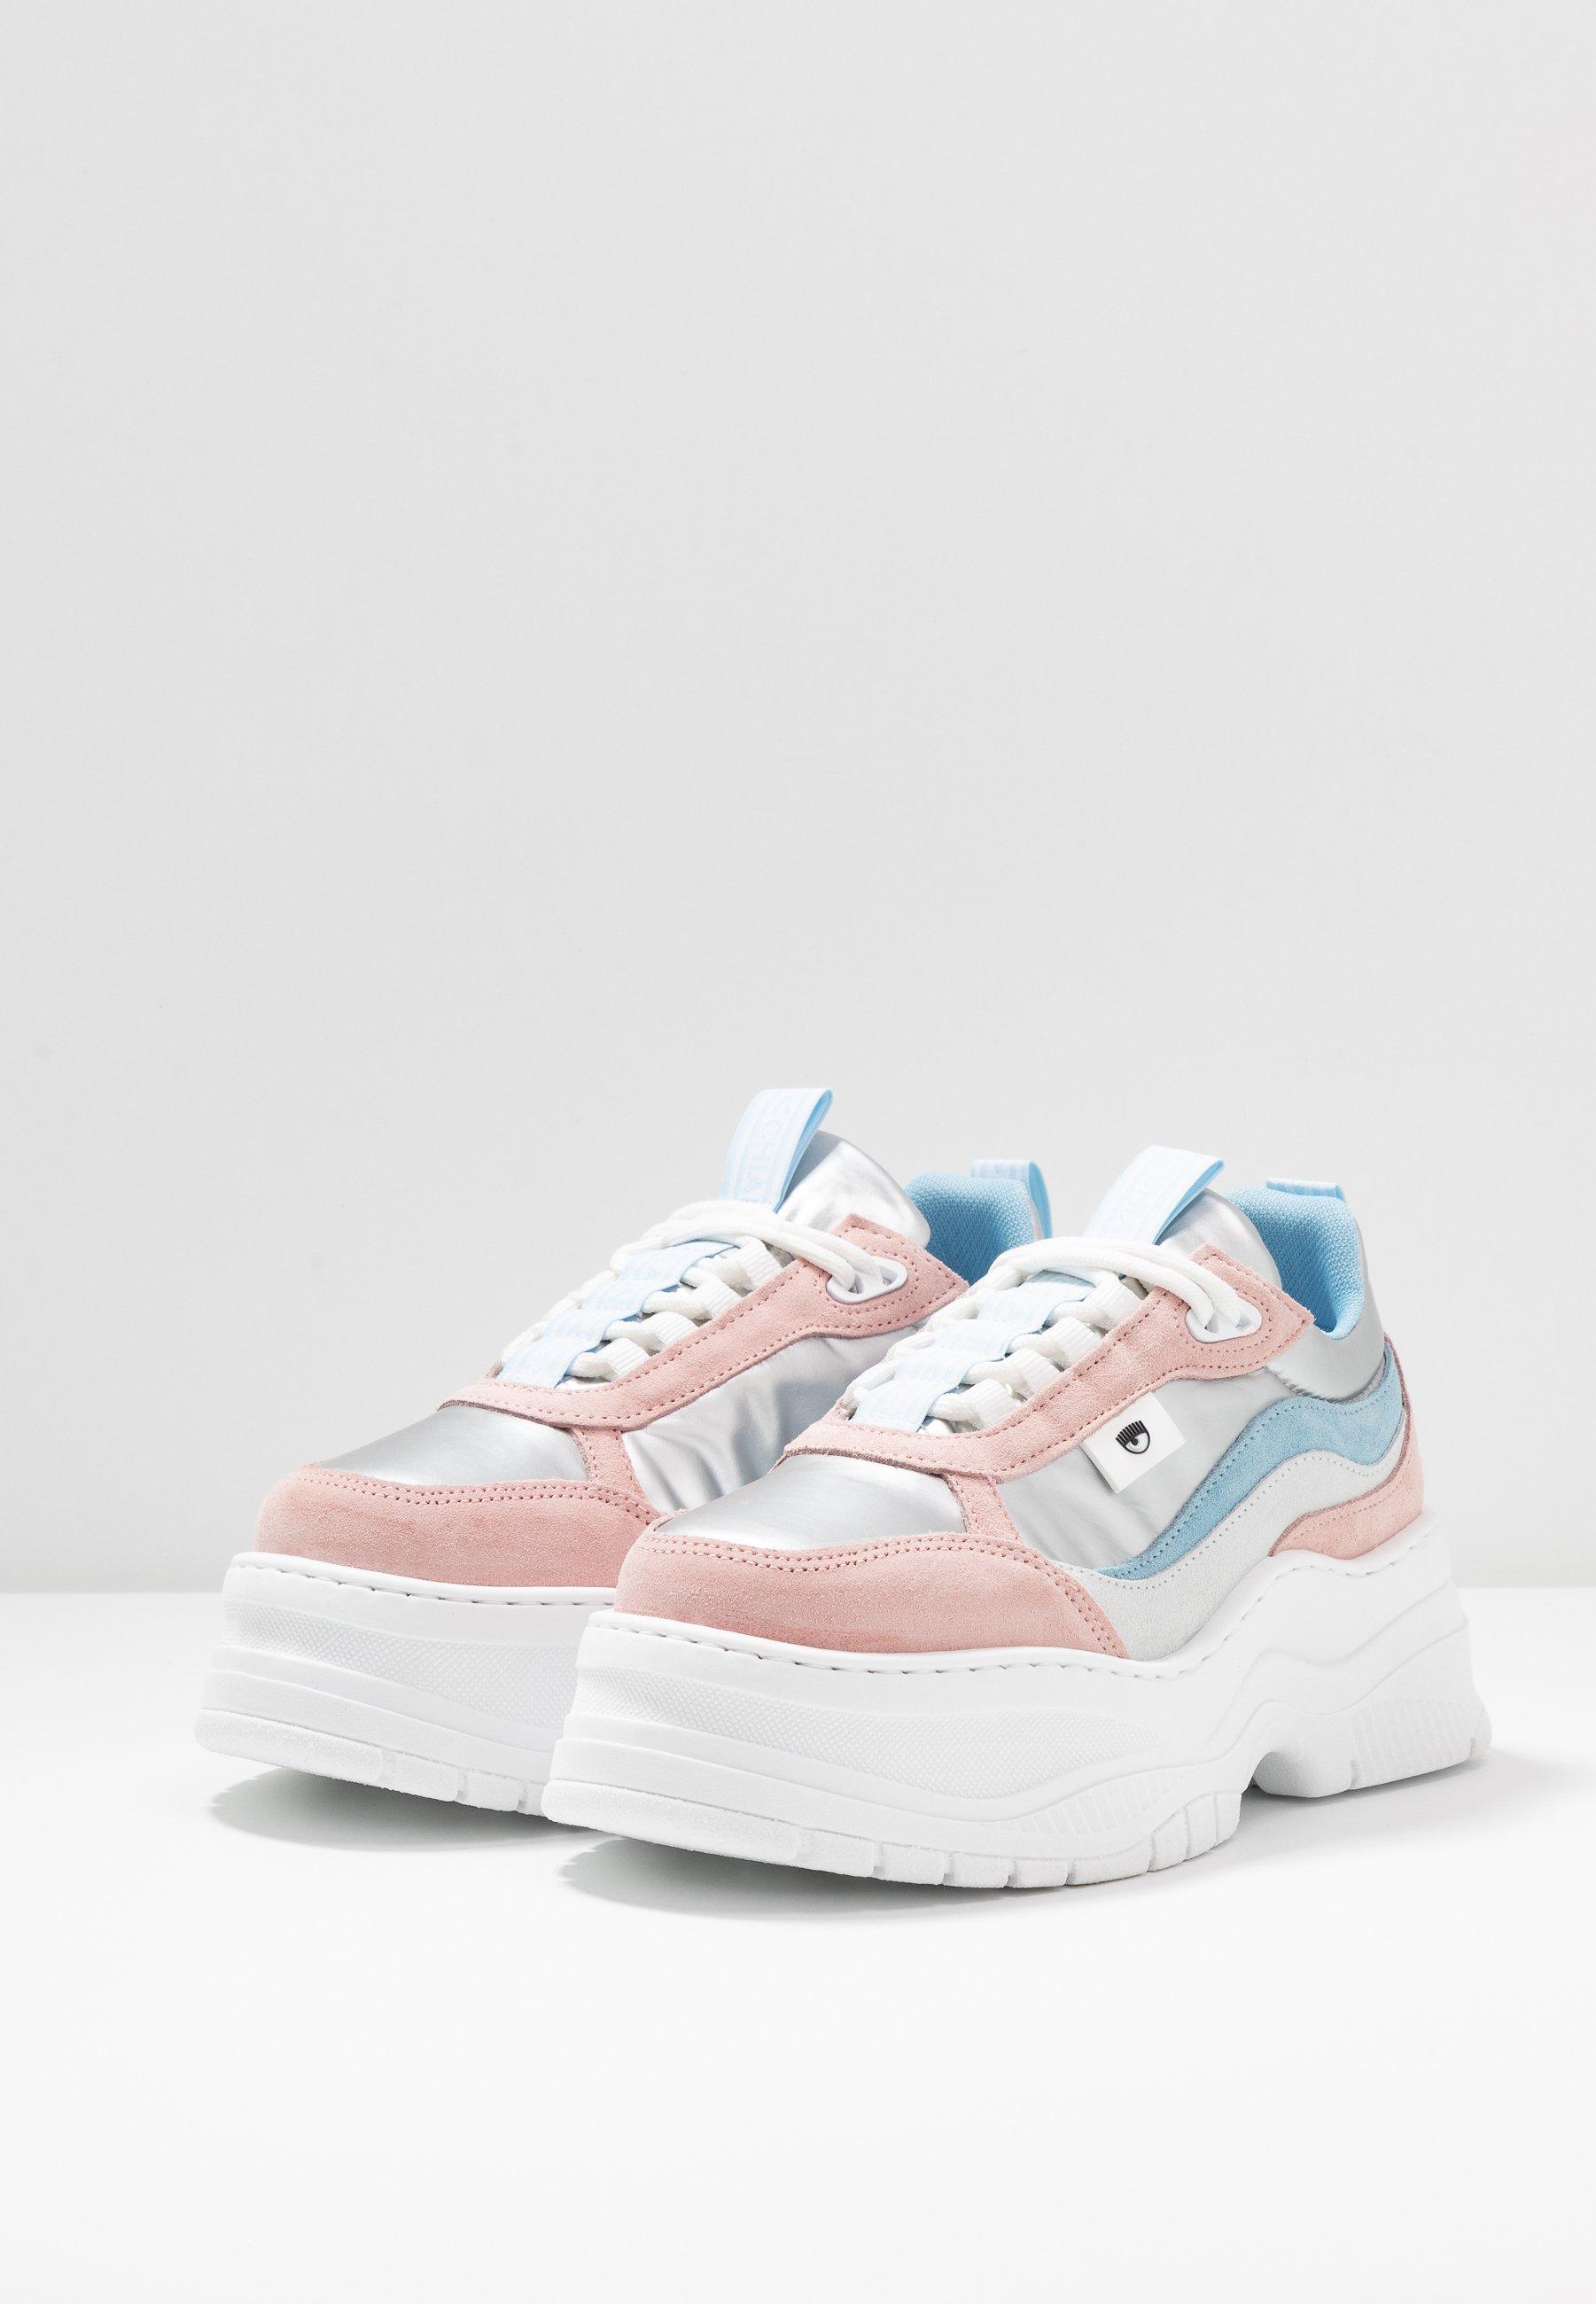 CHIARA FERRAGNI ARMY - Sneakers - pastel/silver